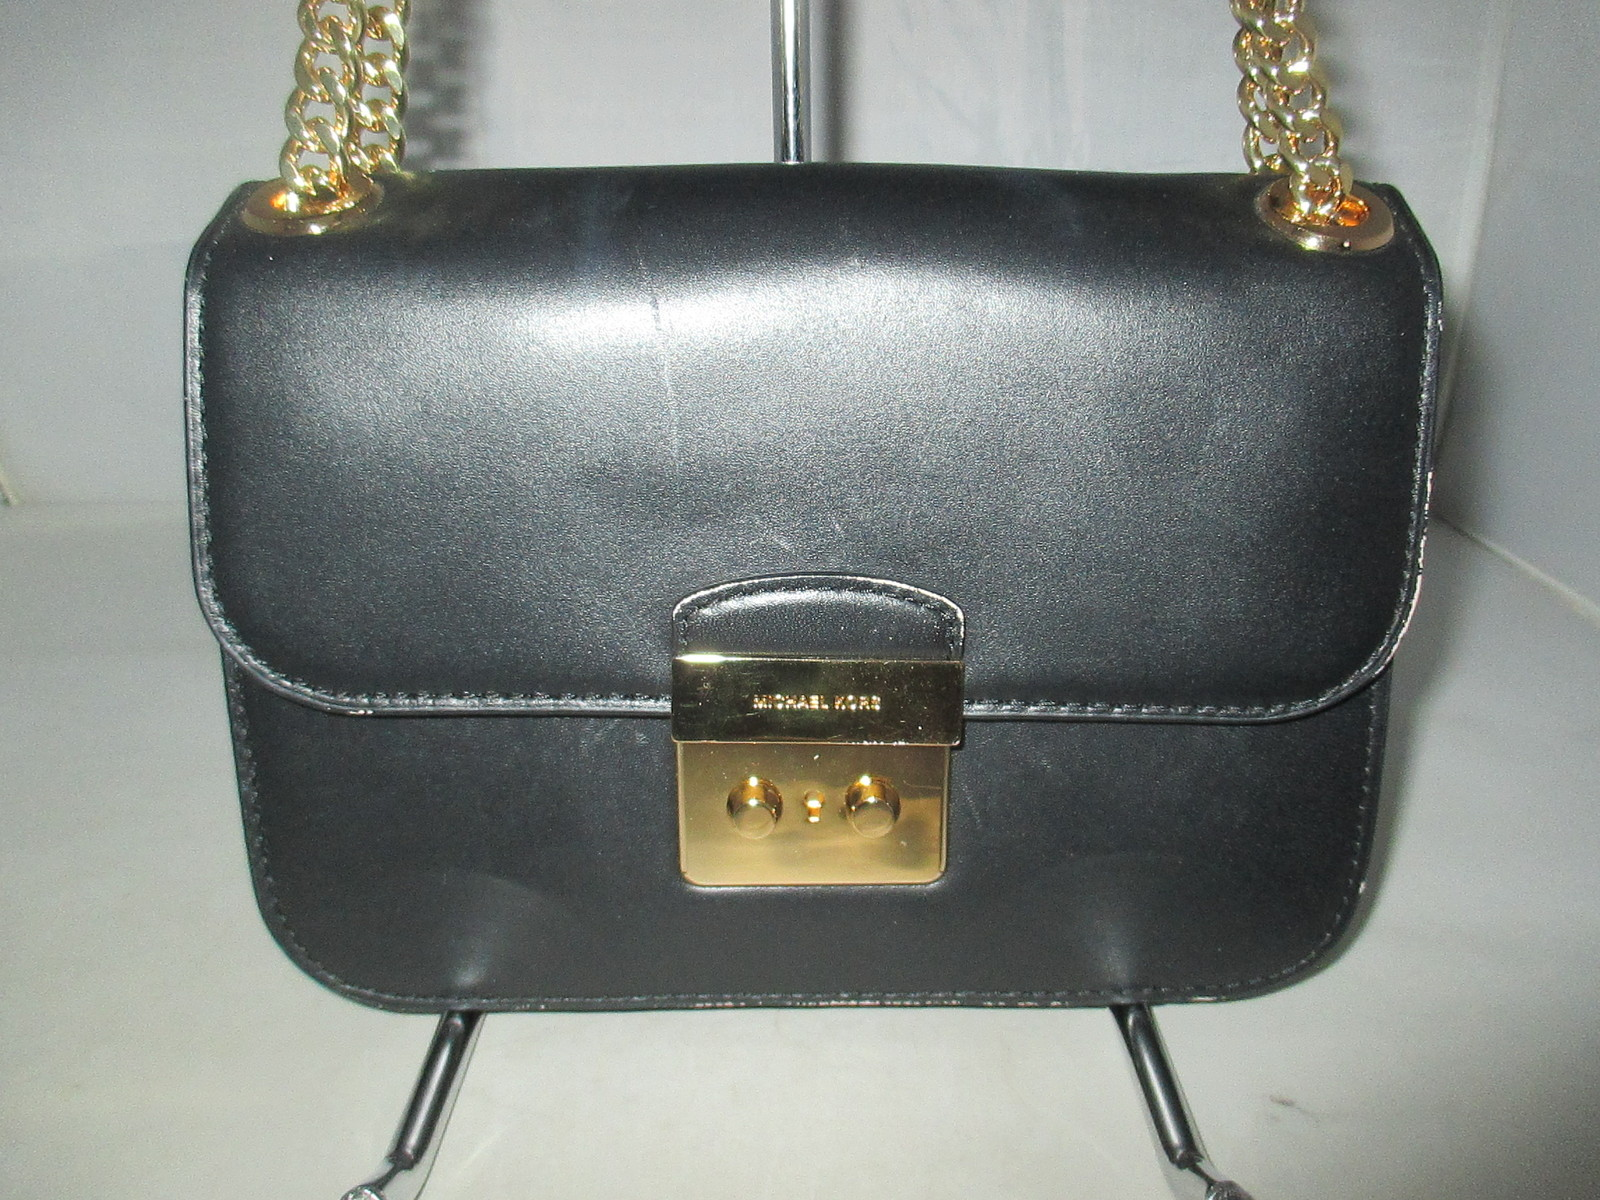 3baf5626b6a6ff Michael Kors Sloan Editor Medium Chain Shoulder Bag, Cross-Body, Messenger  $278